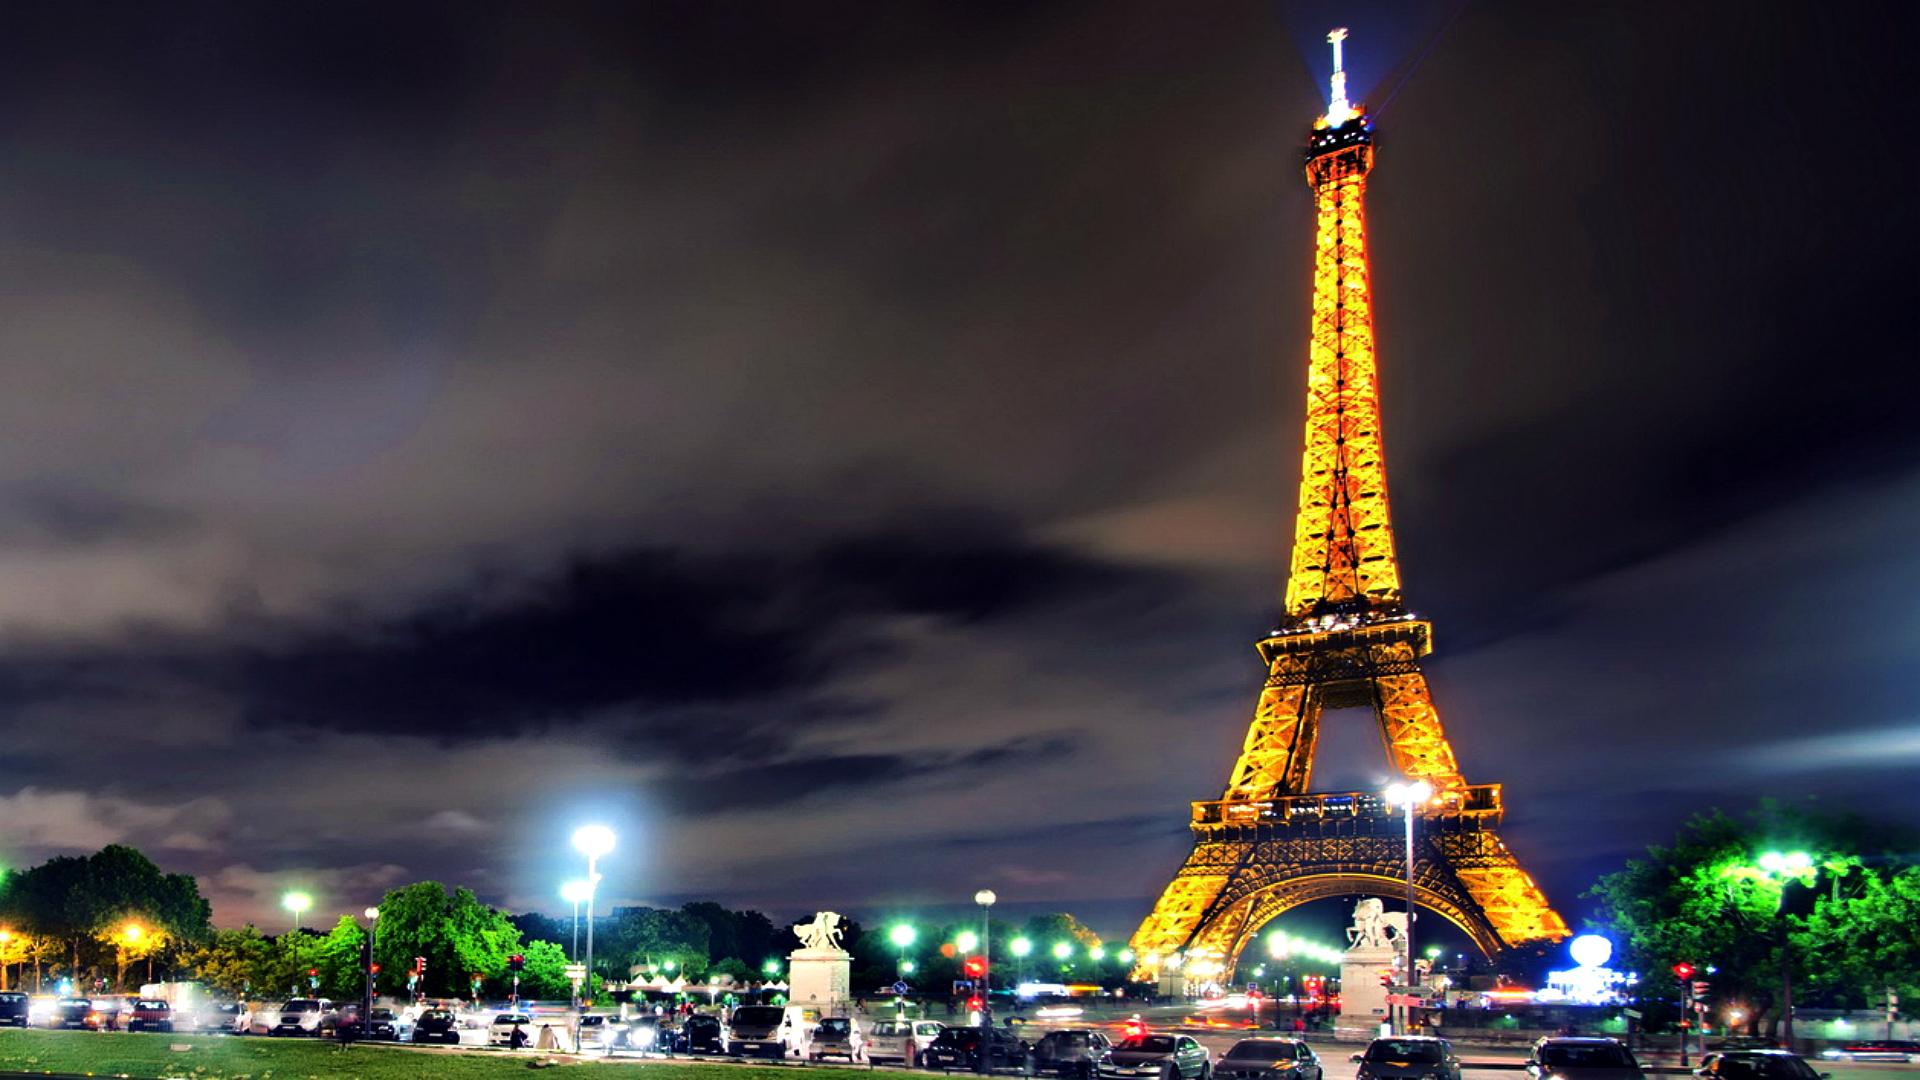 Eiffel-Tower-Best-wallpaper-wpc9004654